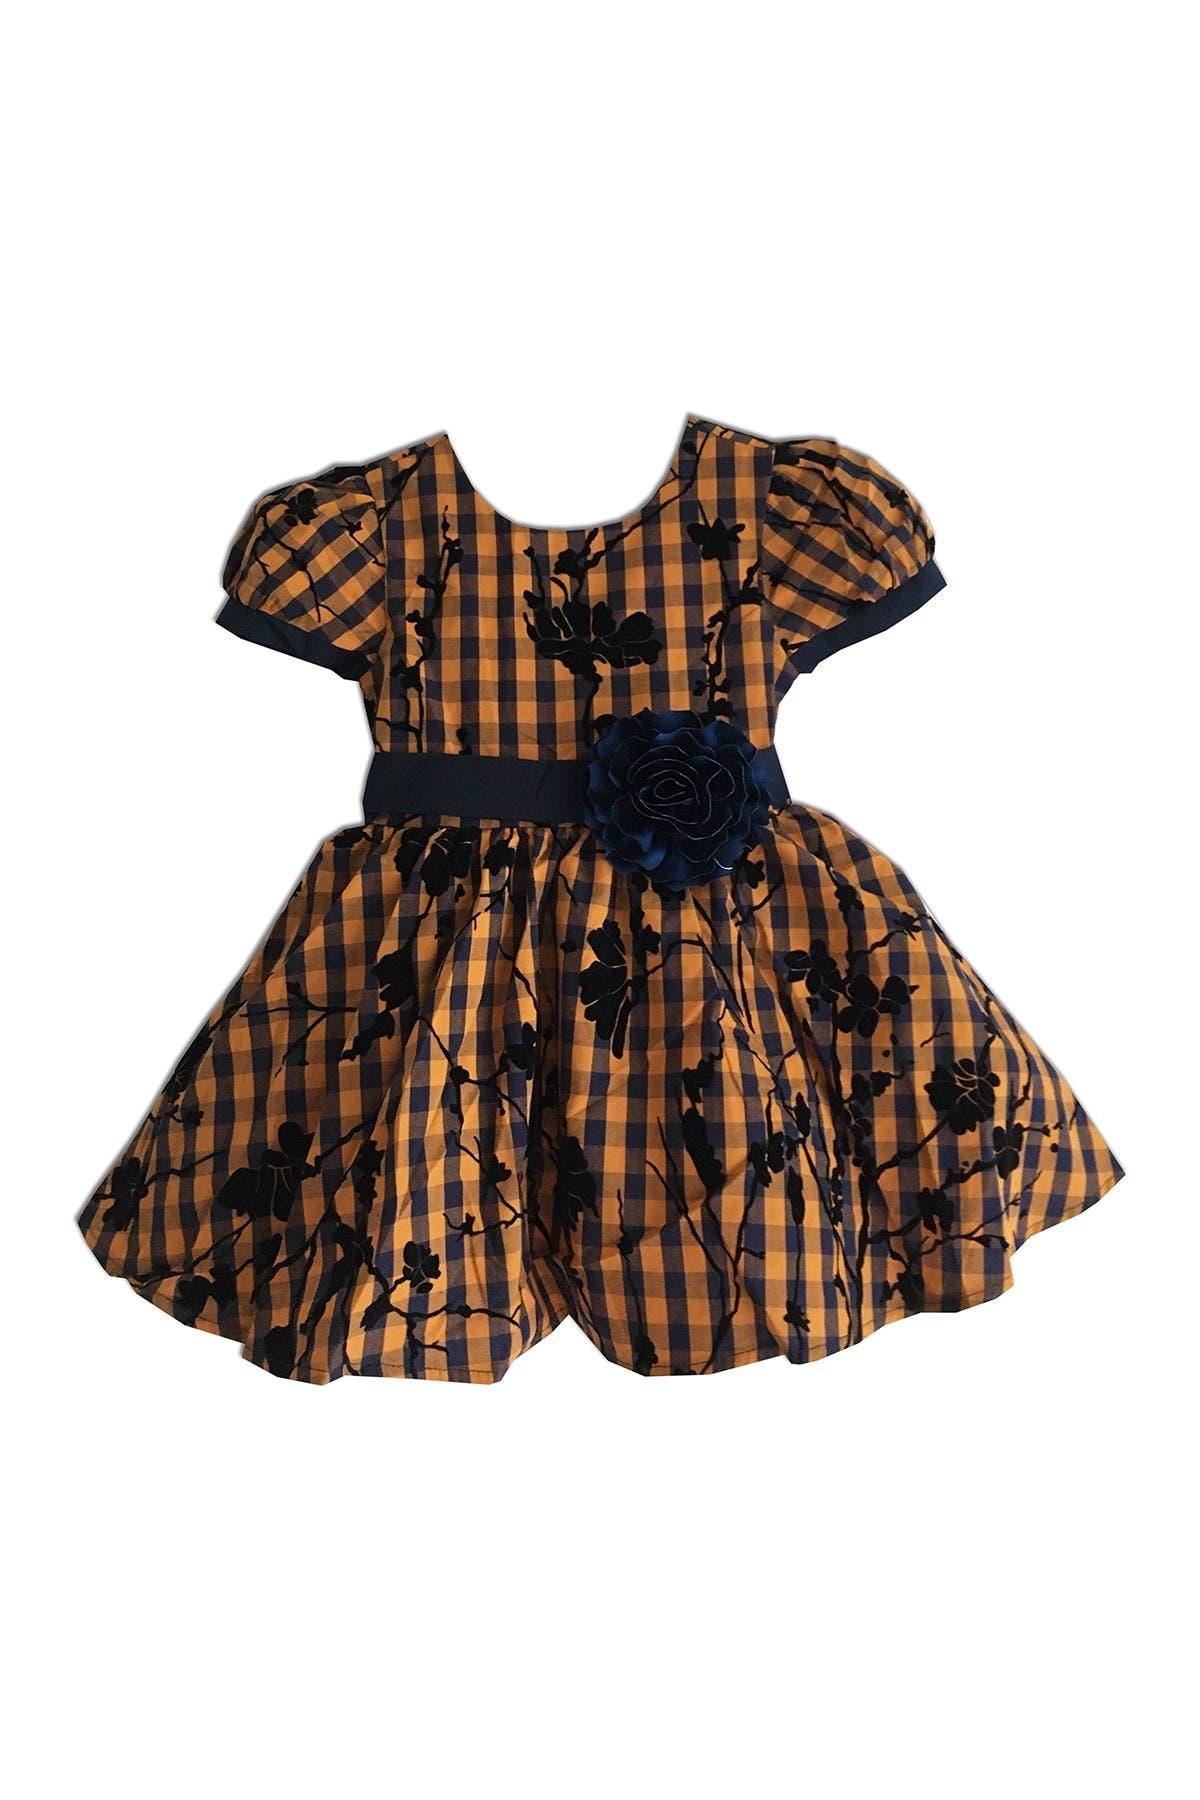 Image of Joe-Ella Brianne Flocked Gingham Dress